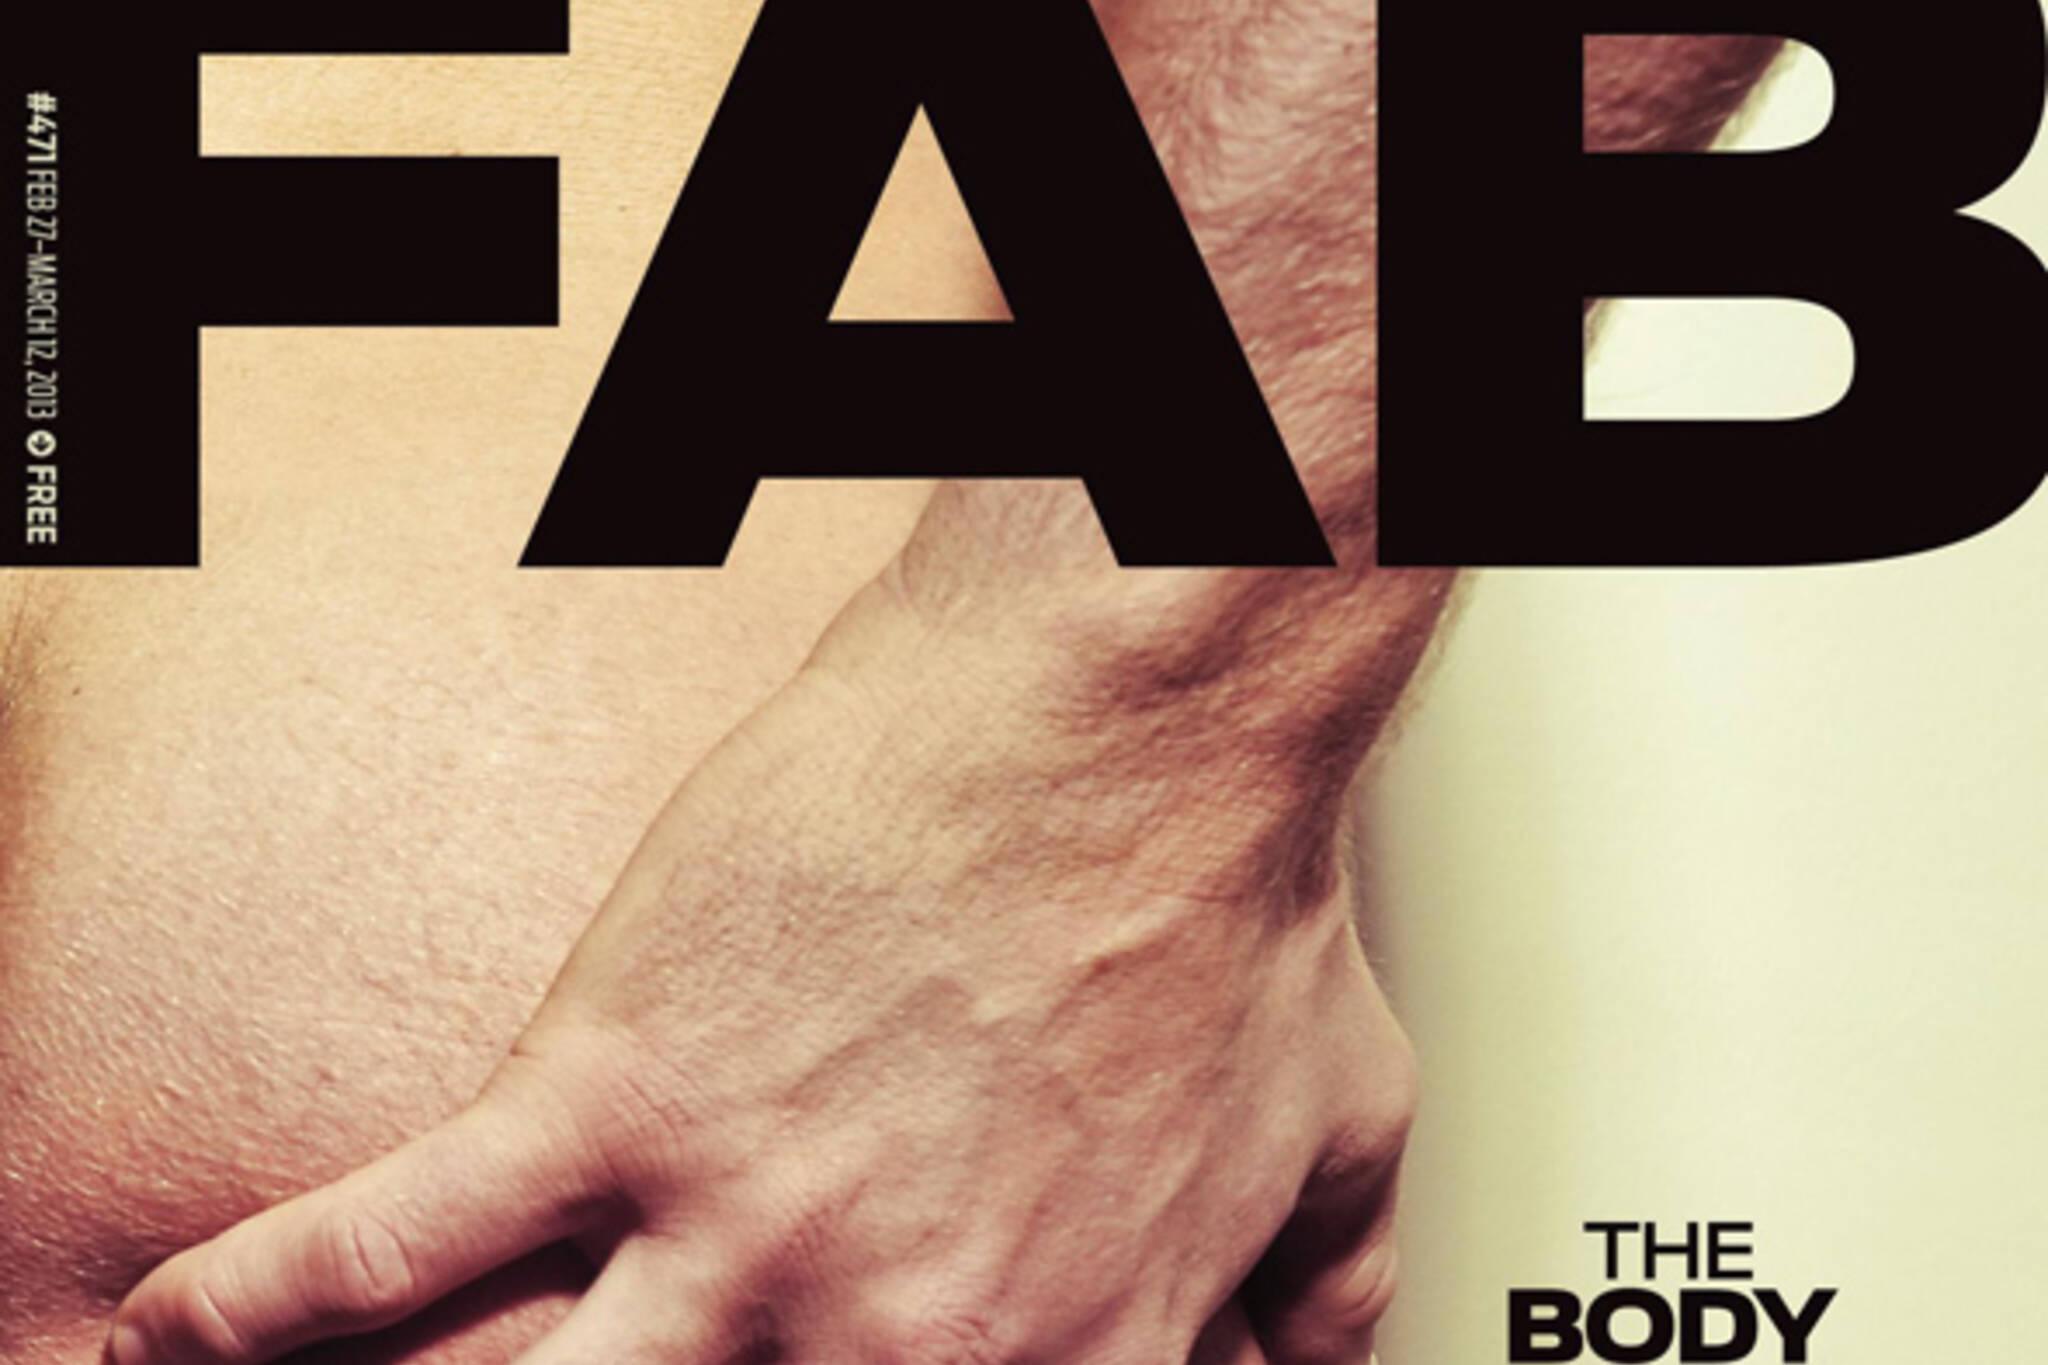 Fab Magazine